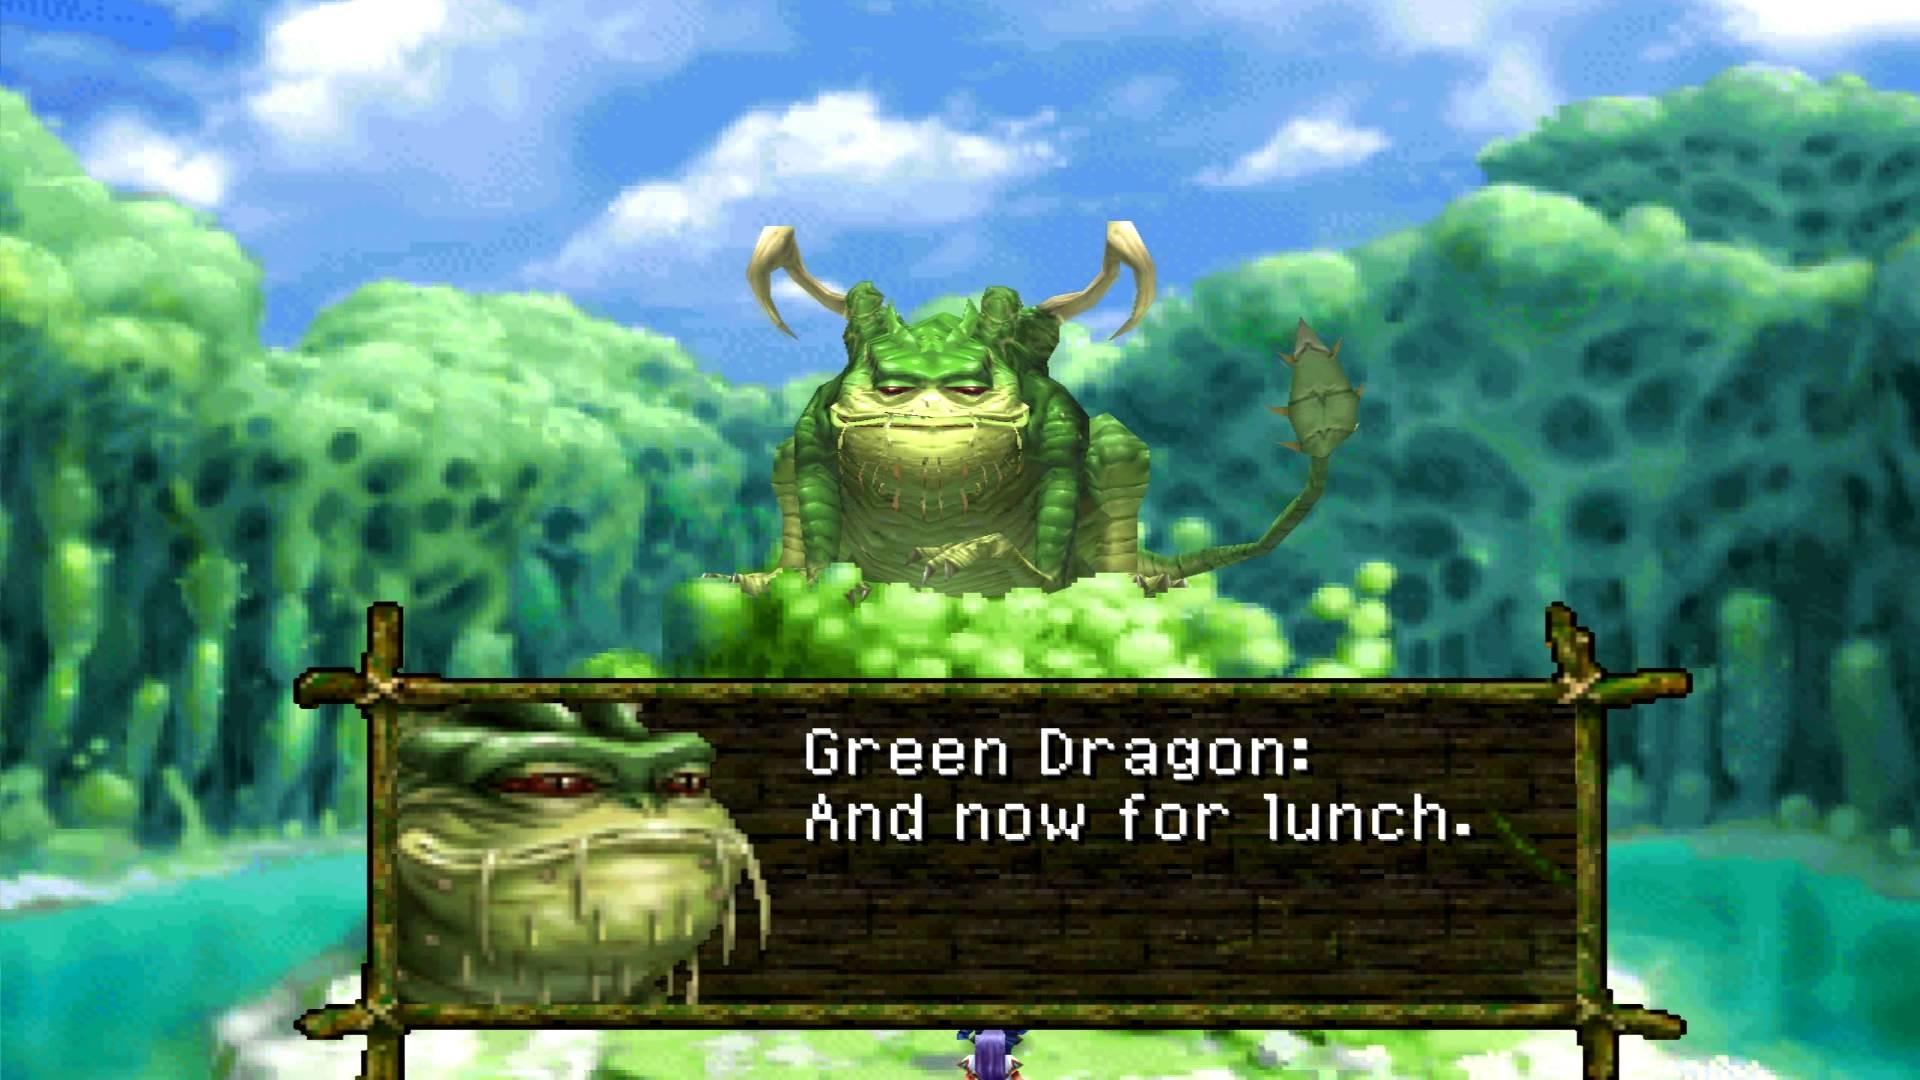 Chrono Cross Boss Tyrano And Green Dragon